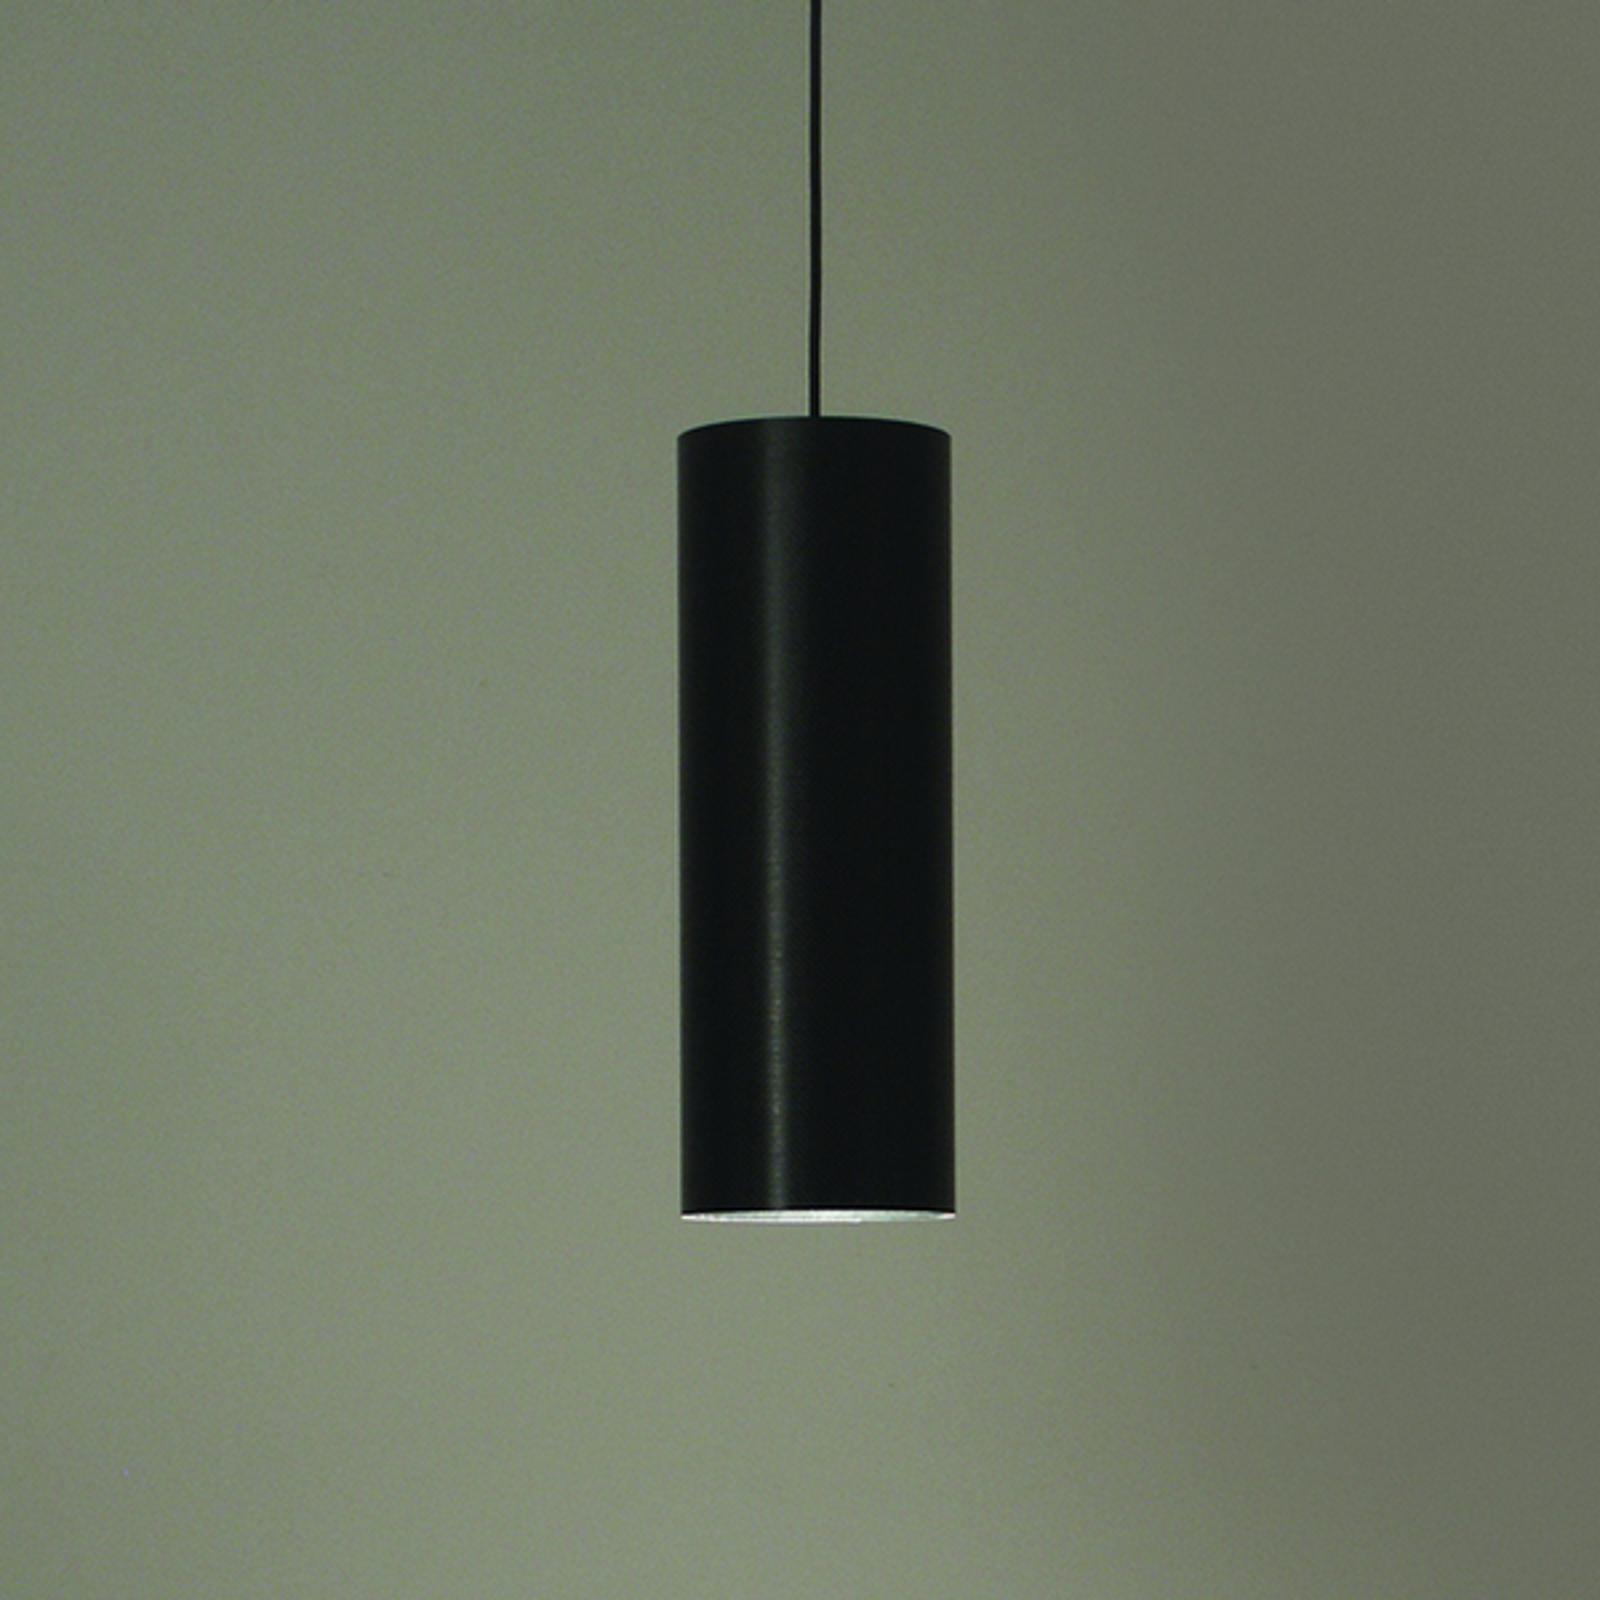 Designerska lampa wisząca Tube 30